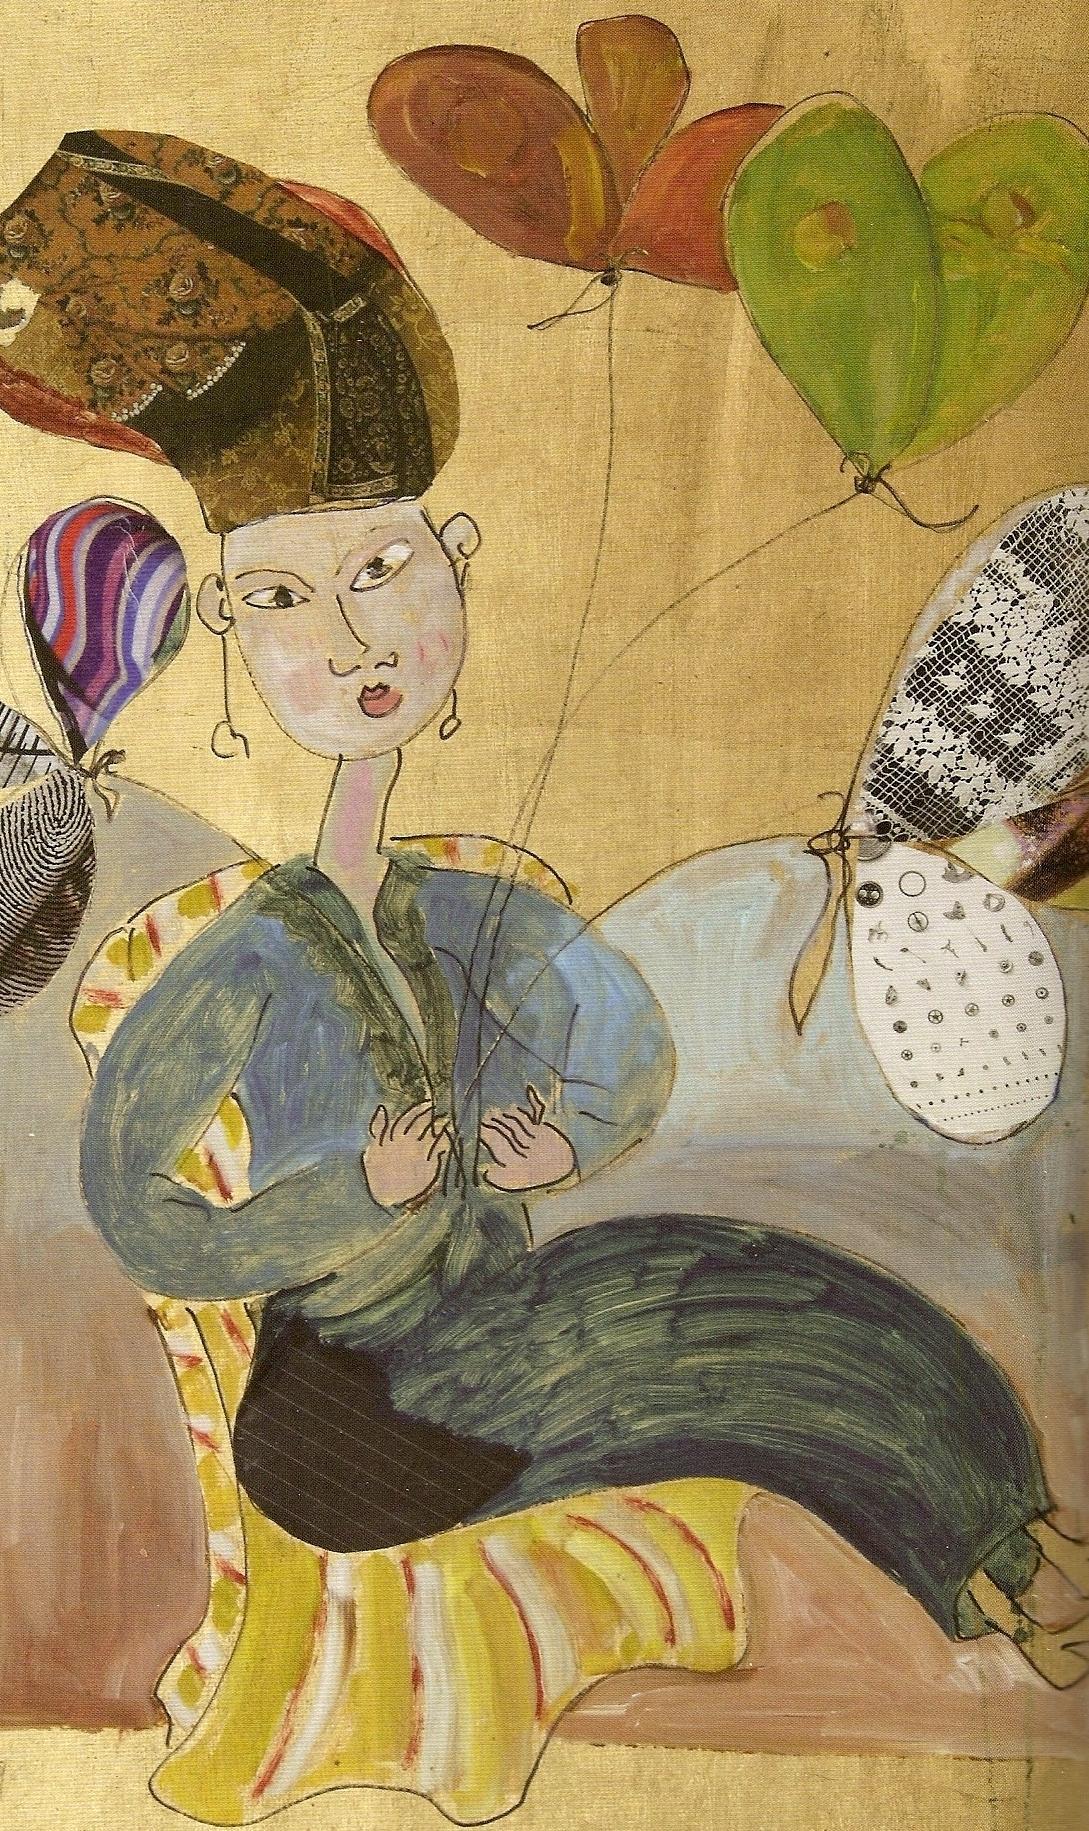 tonino-guerra-penelope-gioca-con-le-farfalle-particolare-20071